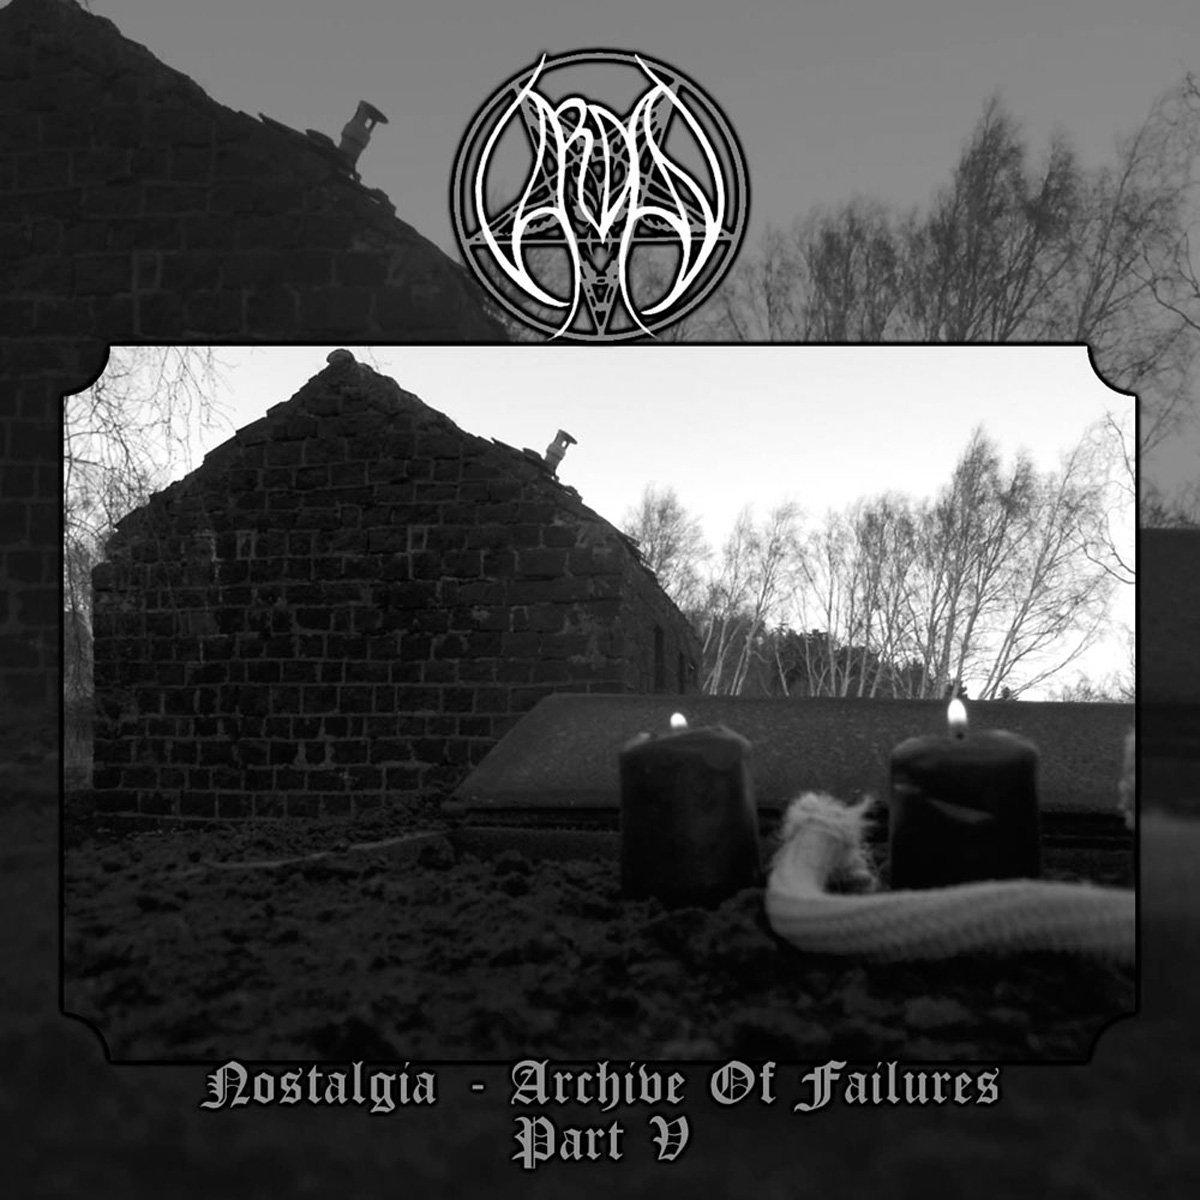 VARDAN / NOSTALGIA - ARCHIVE OF FAILURES PART 5